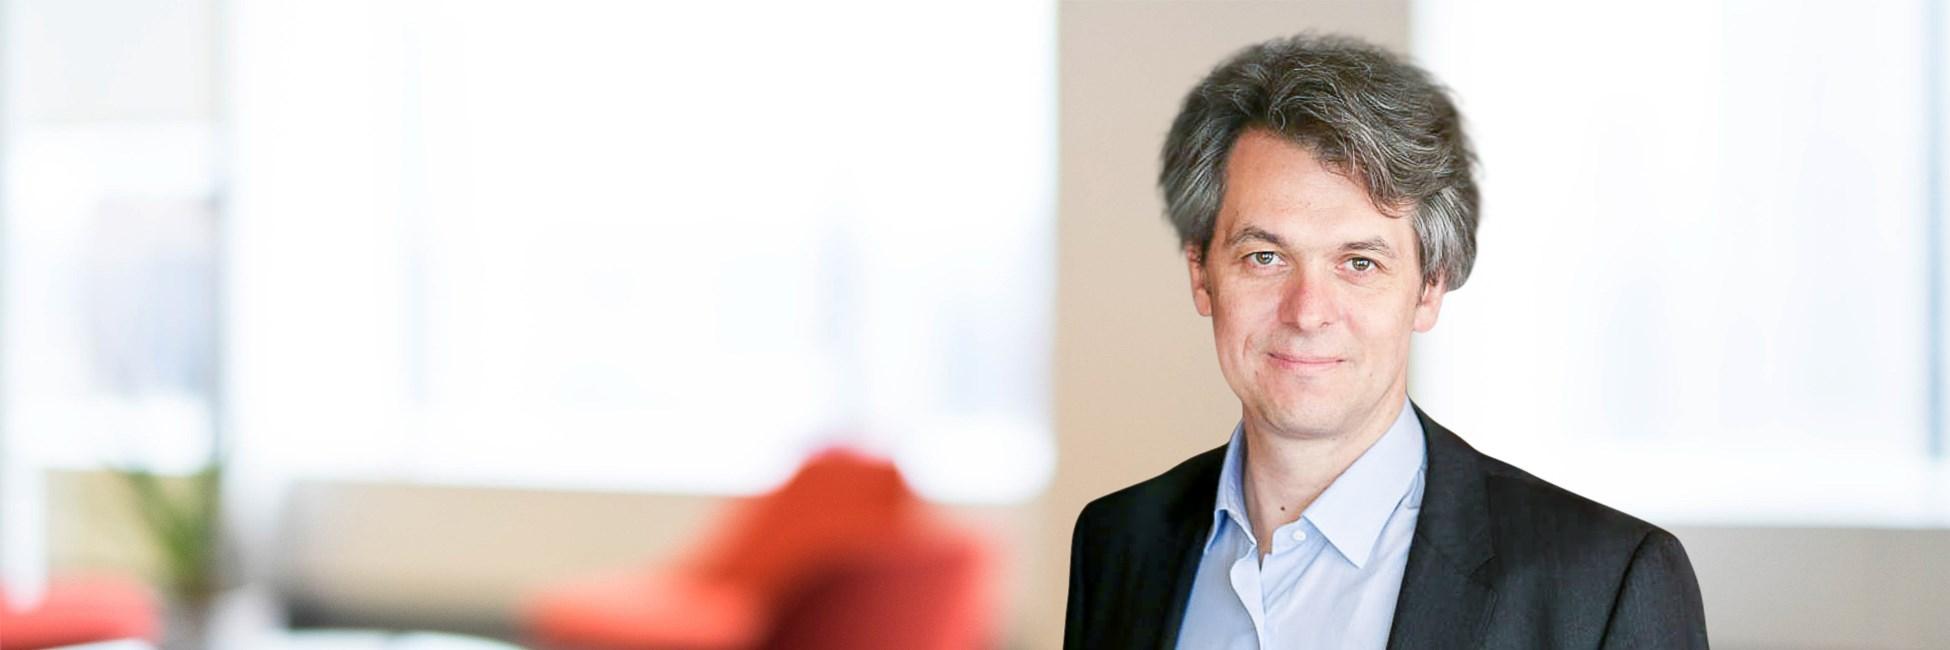 Loic Plantevin - Management Consultant - Bain & Company